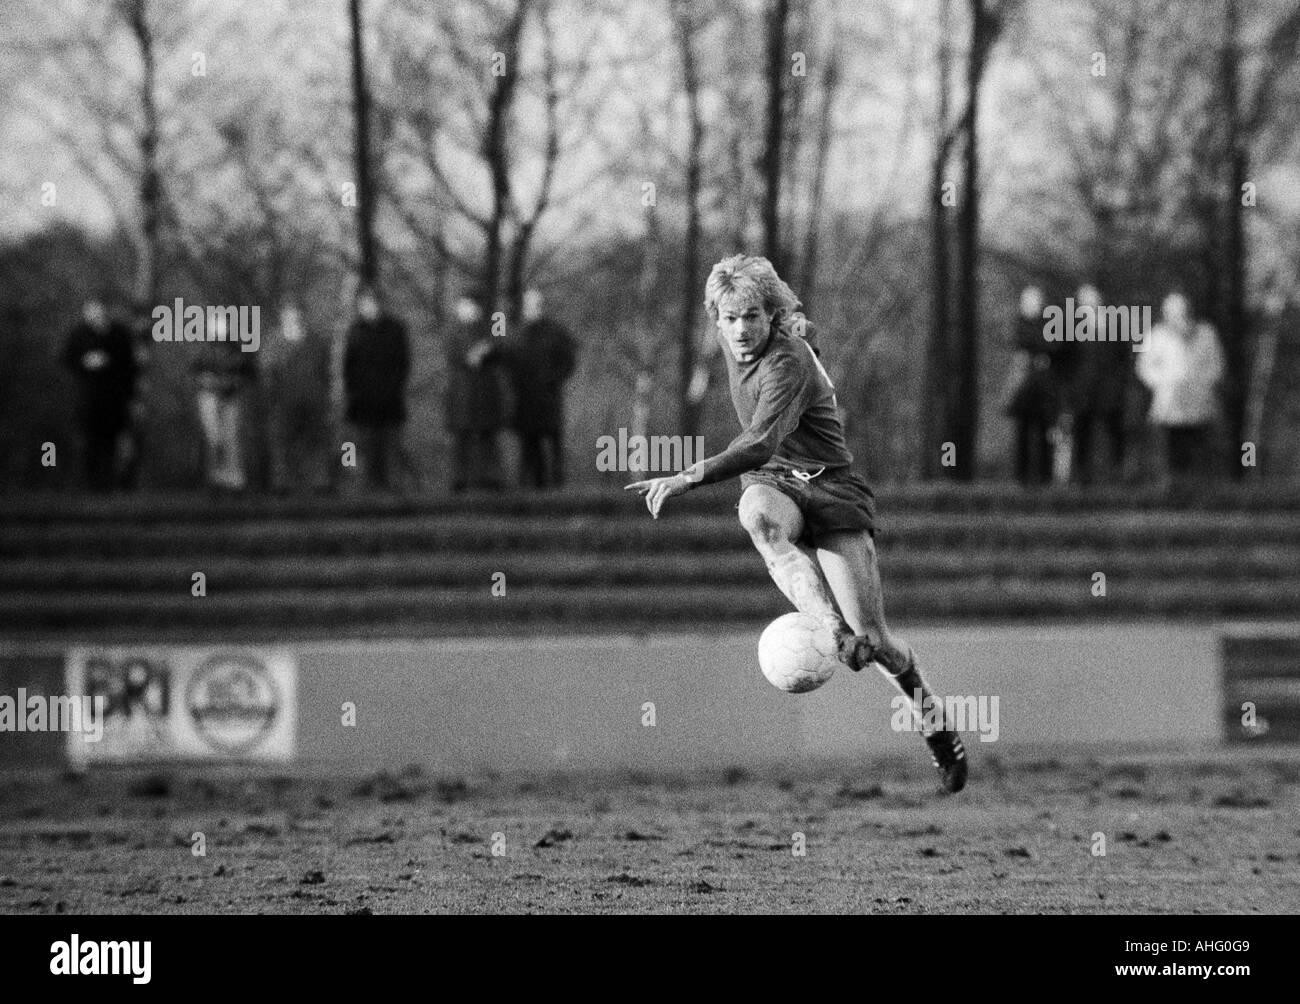 football, Regionalliga West, 1973/1974, Lohrheide Stadium in Bochum-Wattenscheid, SG Wattenscheid 09 versus Sportfreunde Siegen 4:2, scene of the match, Hannes Bongartz (09) shots on goal - Stock Image